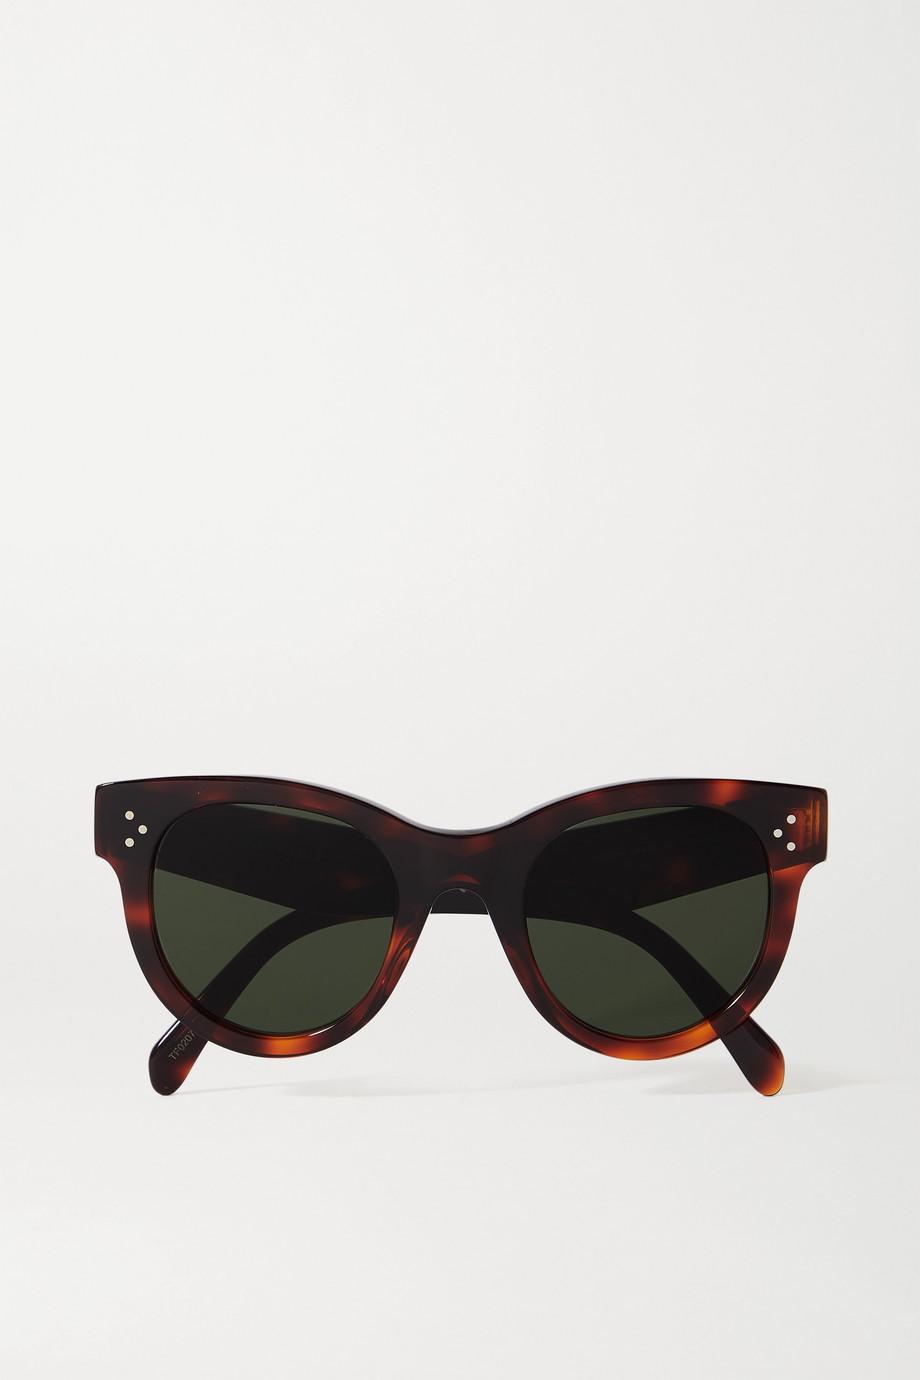 Celine Round-frame tortoiseshell acetate sunglasses